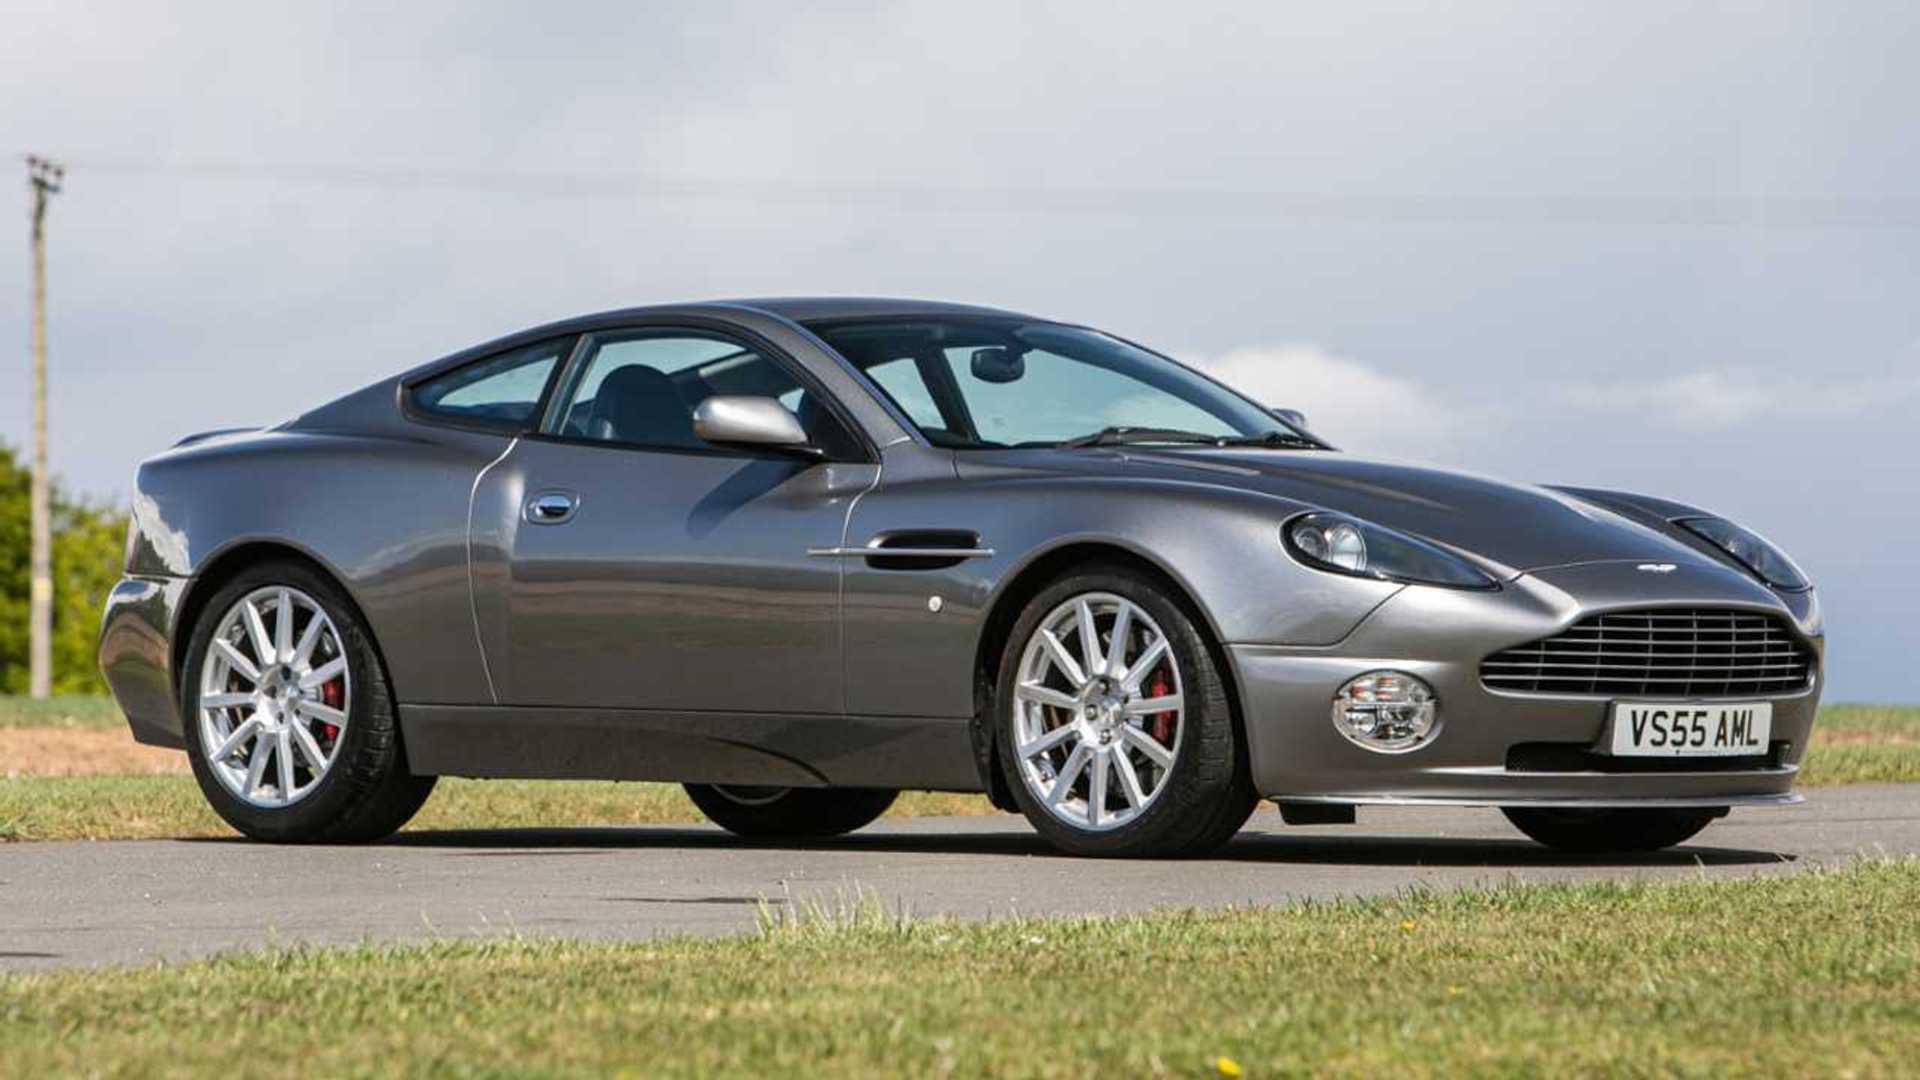 2005 Aston Martin Vanquish S Motor1 Com Photos